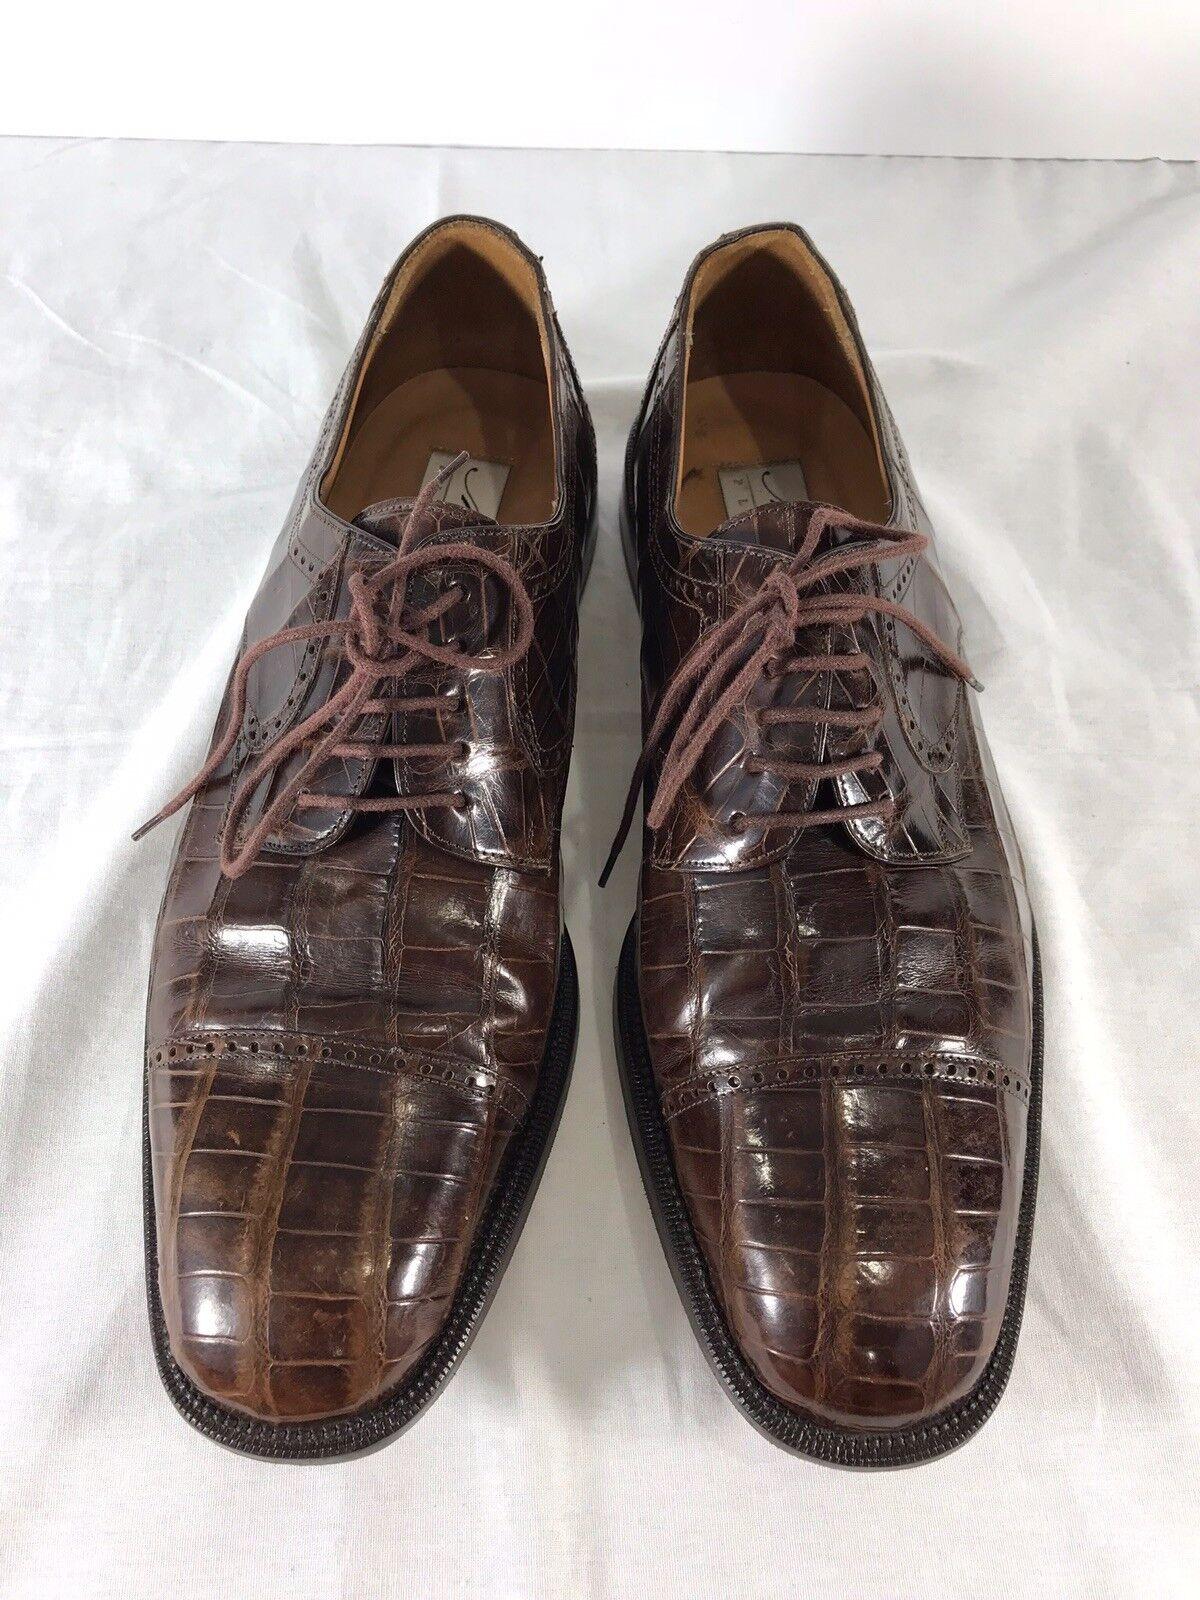 MEZLAN Platinum Brown Alligator Mens shoes 11US Made in Spain